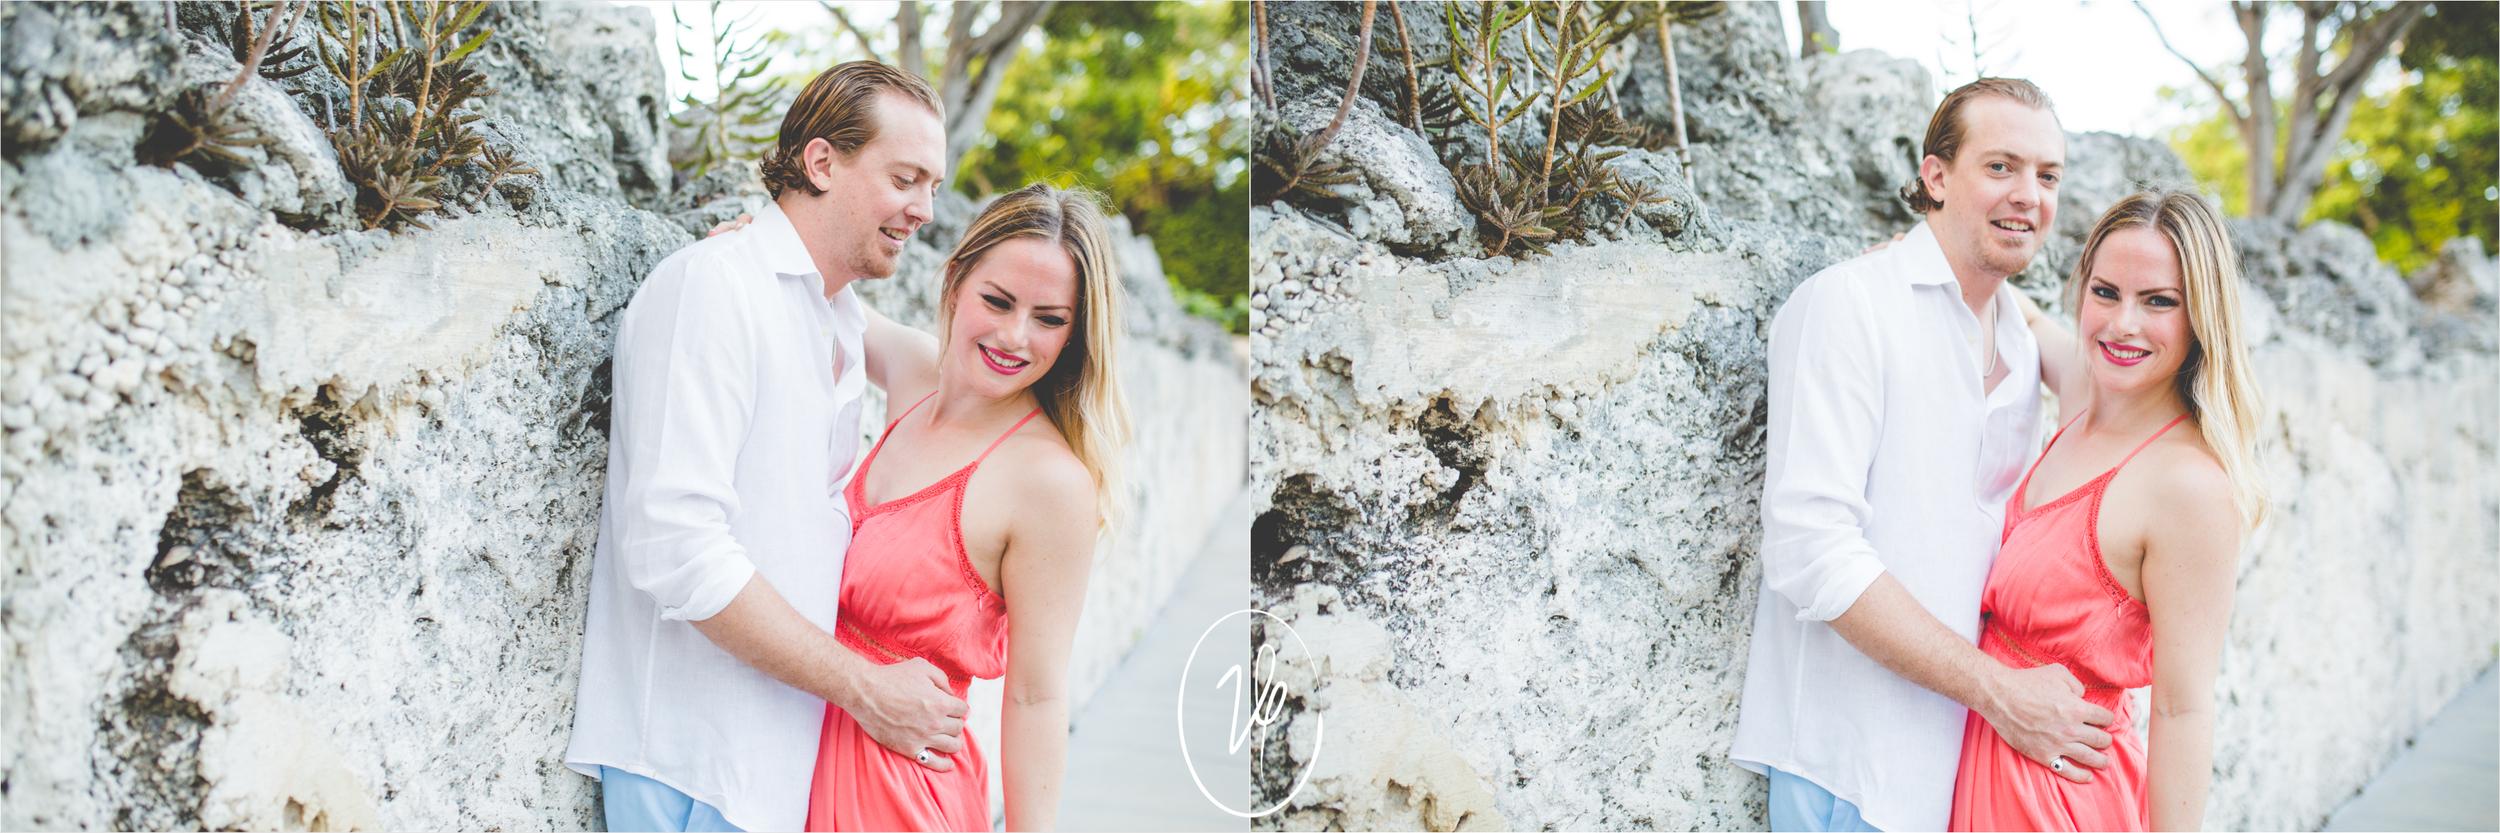 Viridian Ivy Images | Florida Keys Wedding Photographer